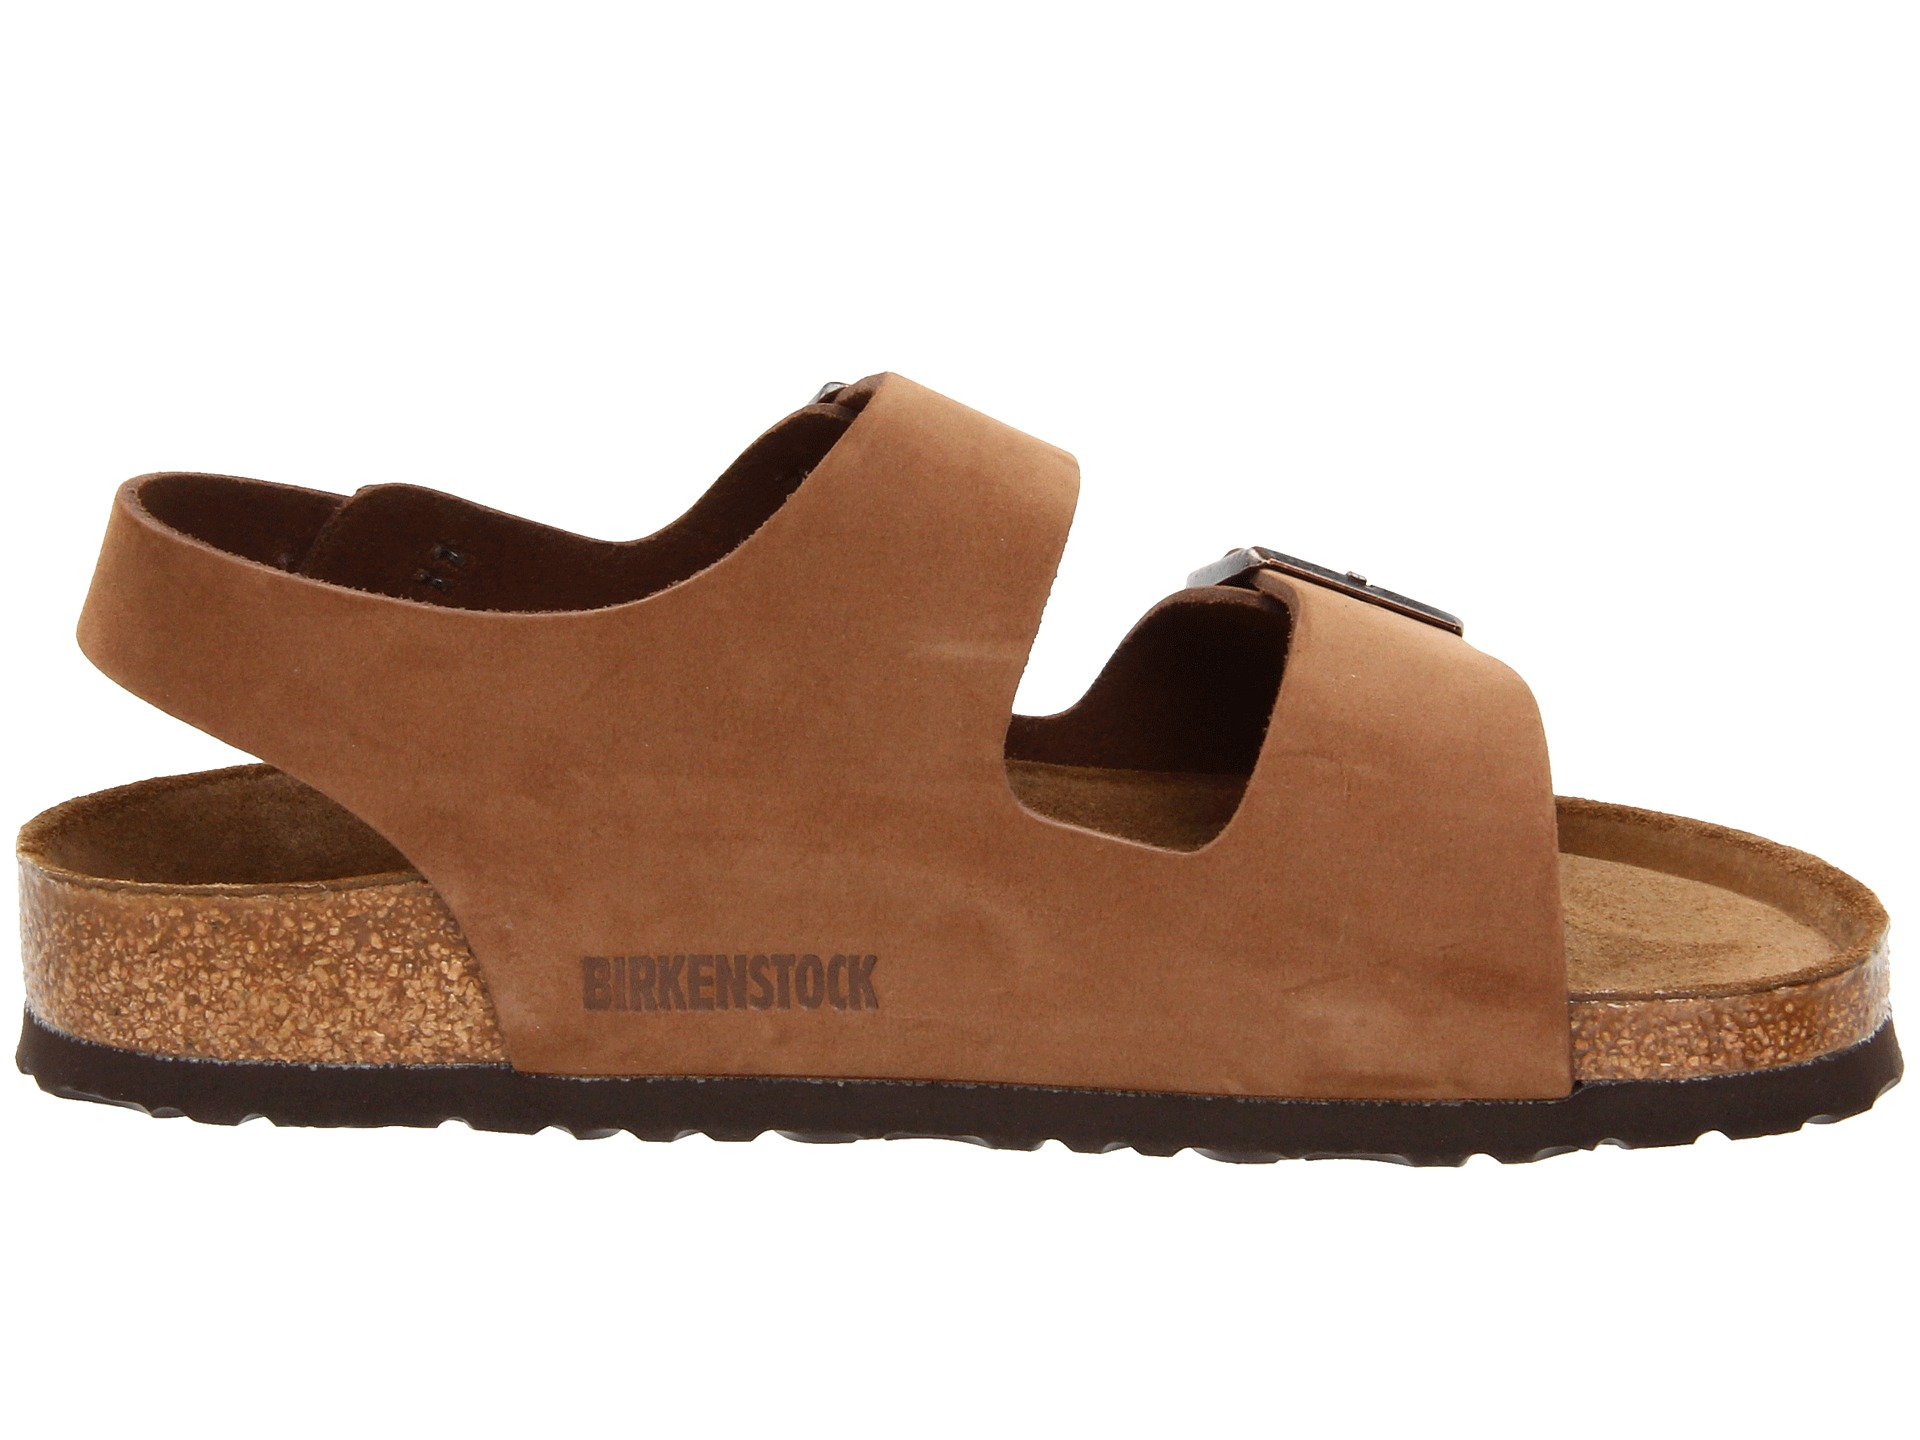 963461a080e Birkenstock Chania Name Flat Silver Sandals